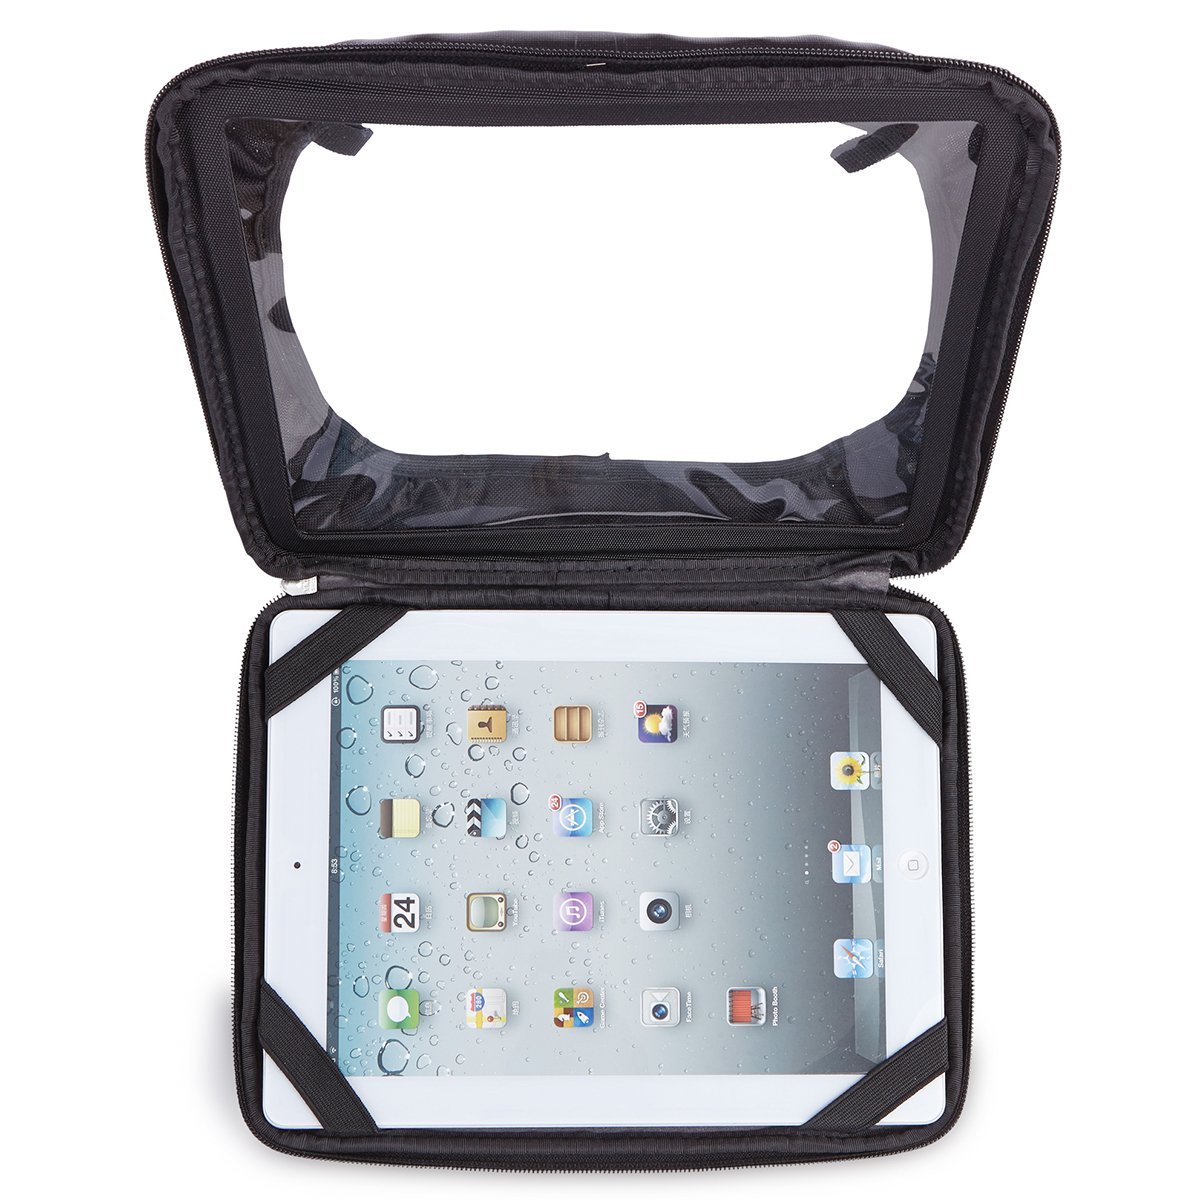 Guidão Map Bolsa iPad Bolsa Preto Tablet Thule p Sleeve p qFwtpaT